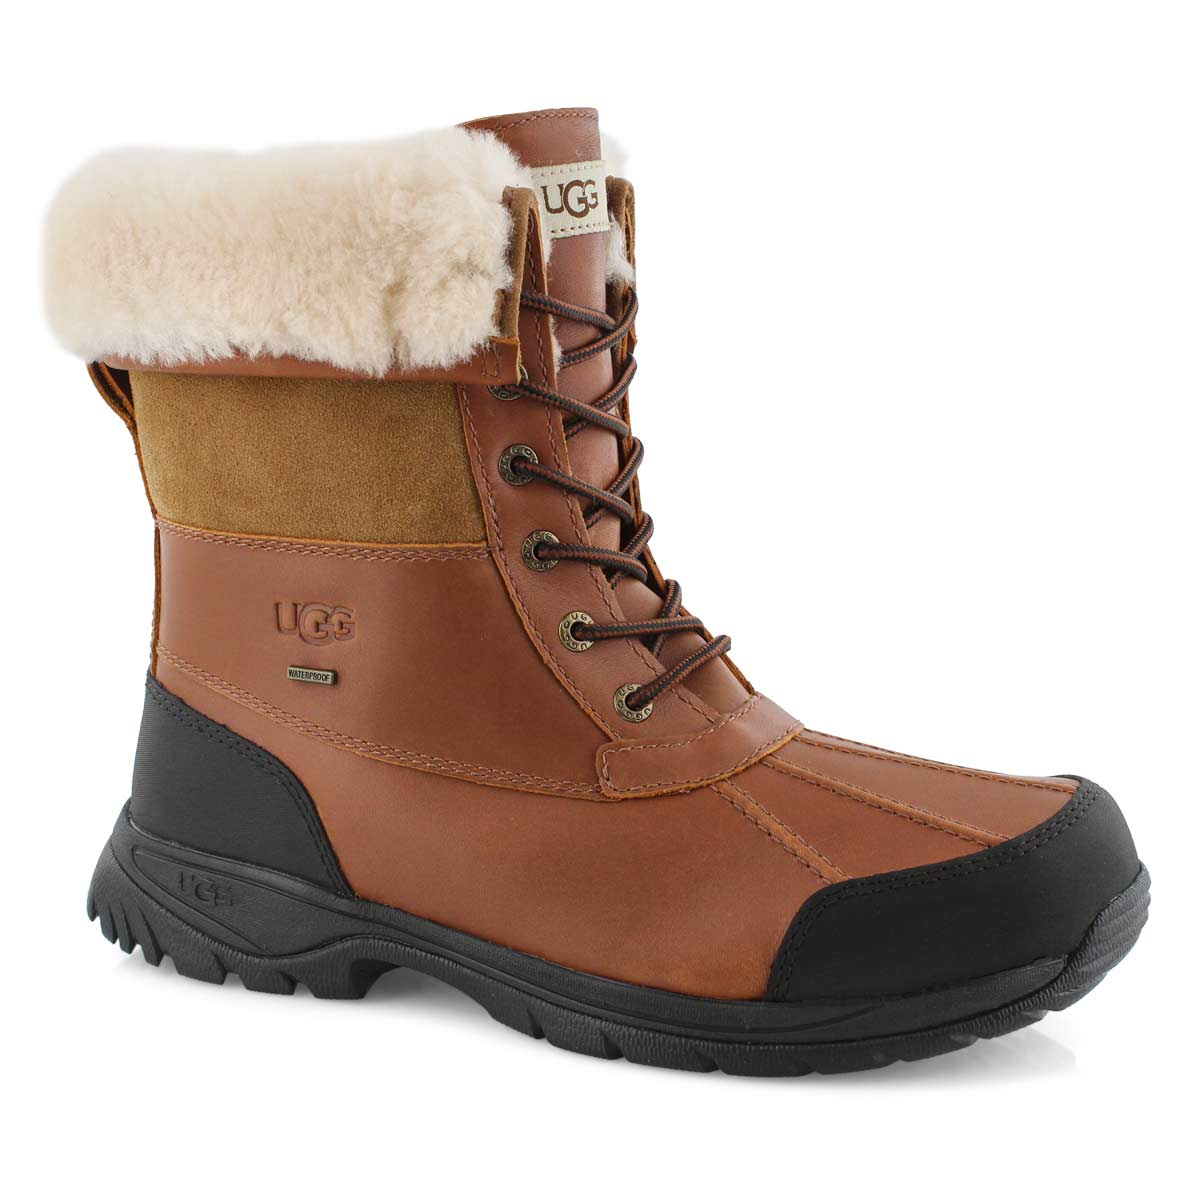 Mns Butte worchester sheepskin boot